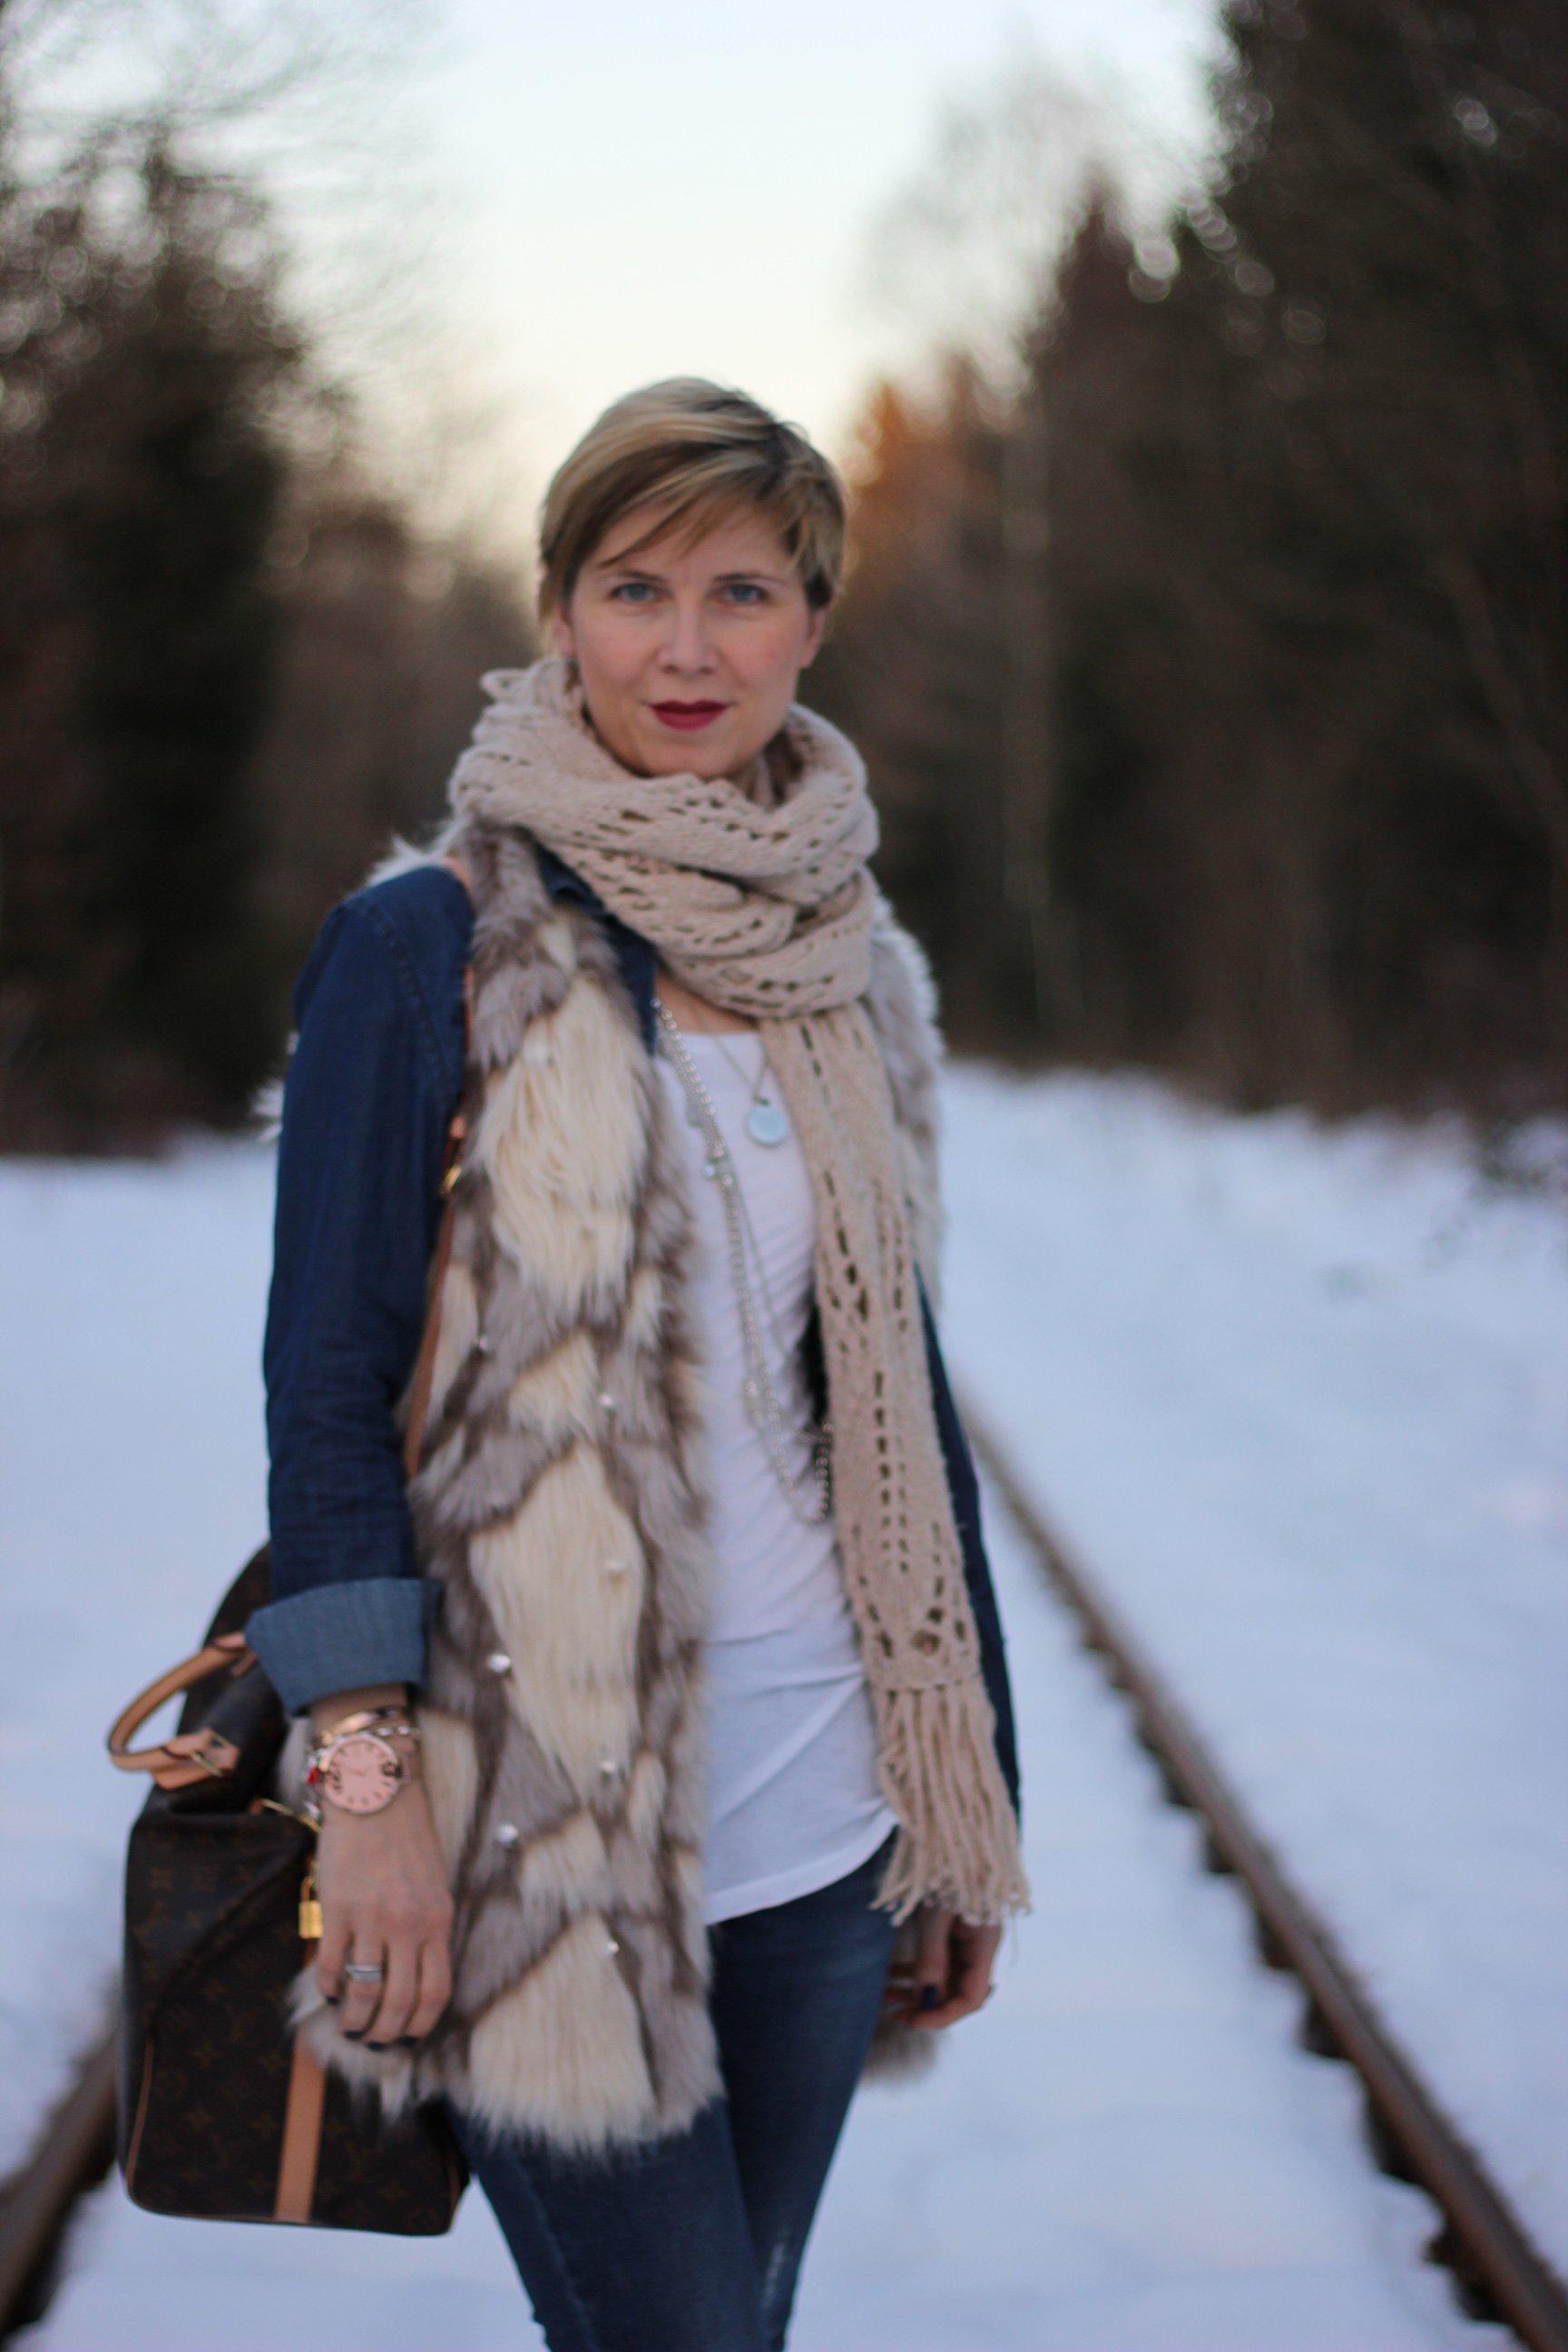 IMG_9922_INSTA_OnlyJeans_FakeFurCream_MarcoPolo_UGGs_Winter